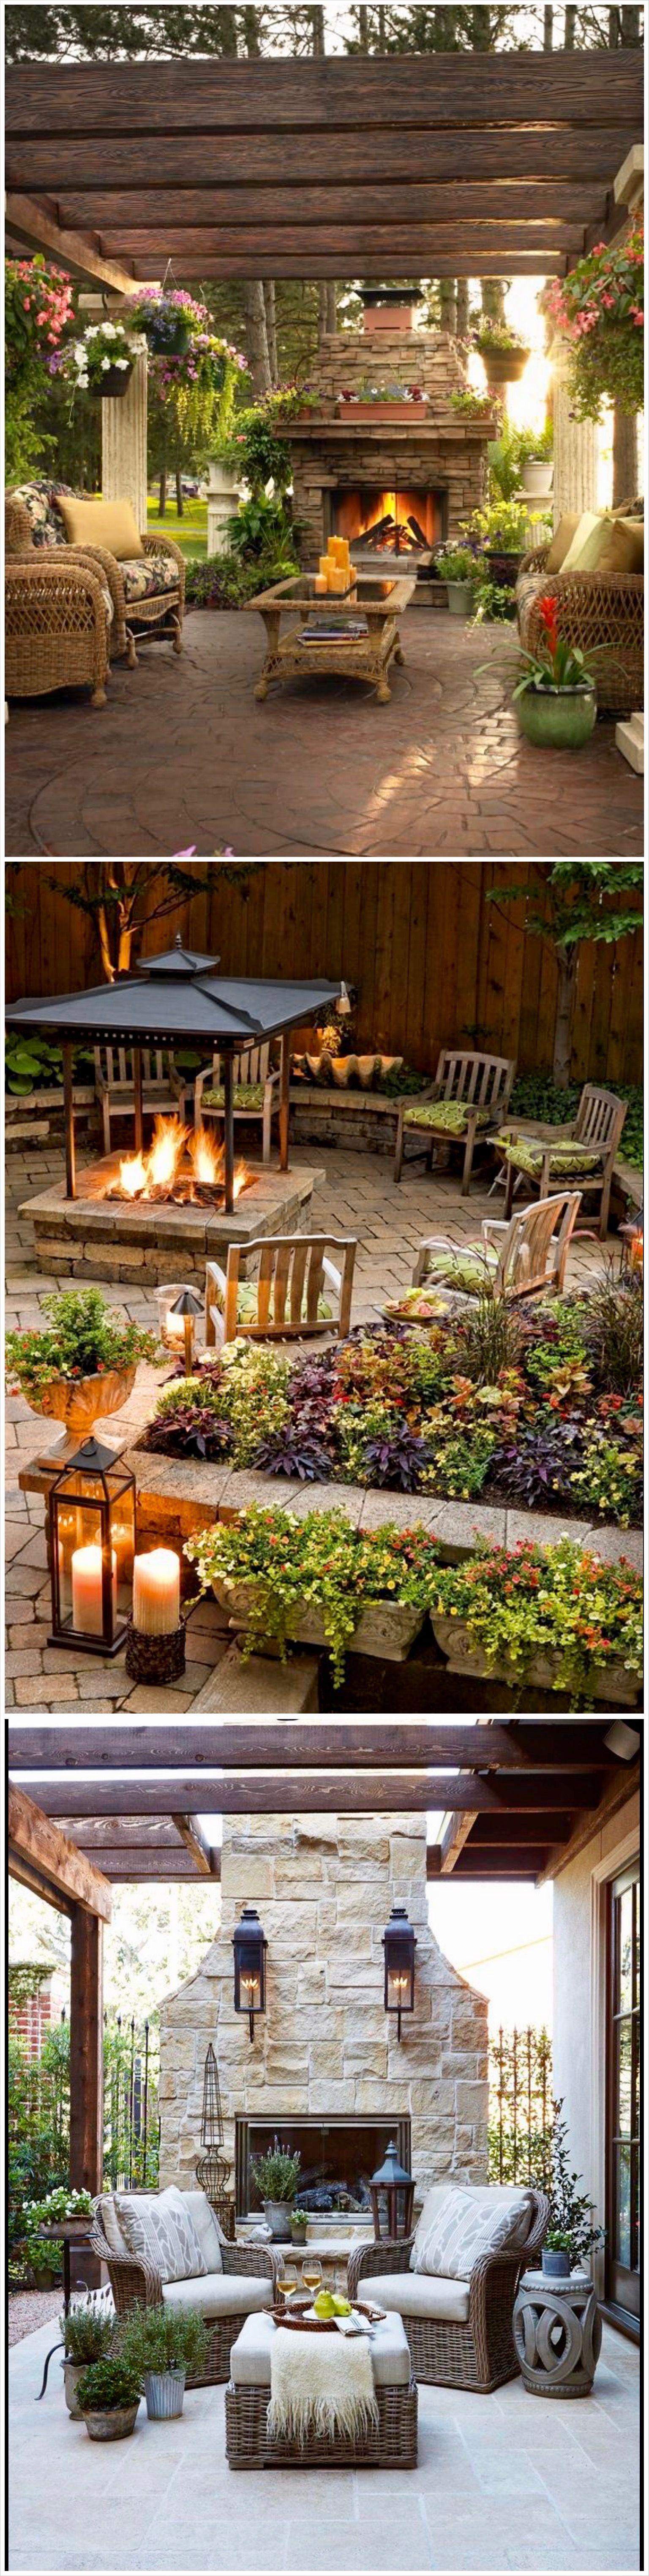 0320d72886428d9a91c1ec12ef1fd0f1 Top Result 50 Awesome Cost Of Outdoor Fireplace Picture 2018 Zat3